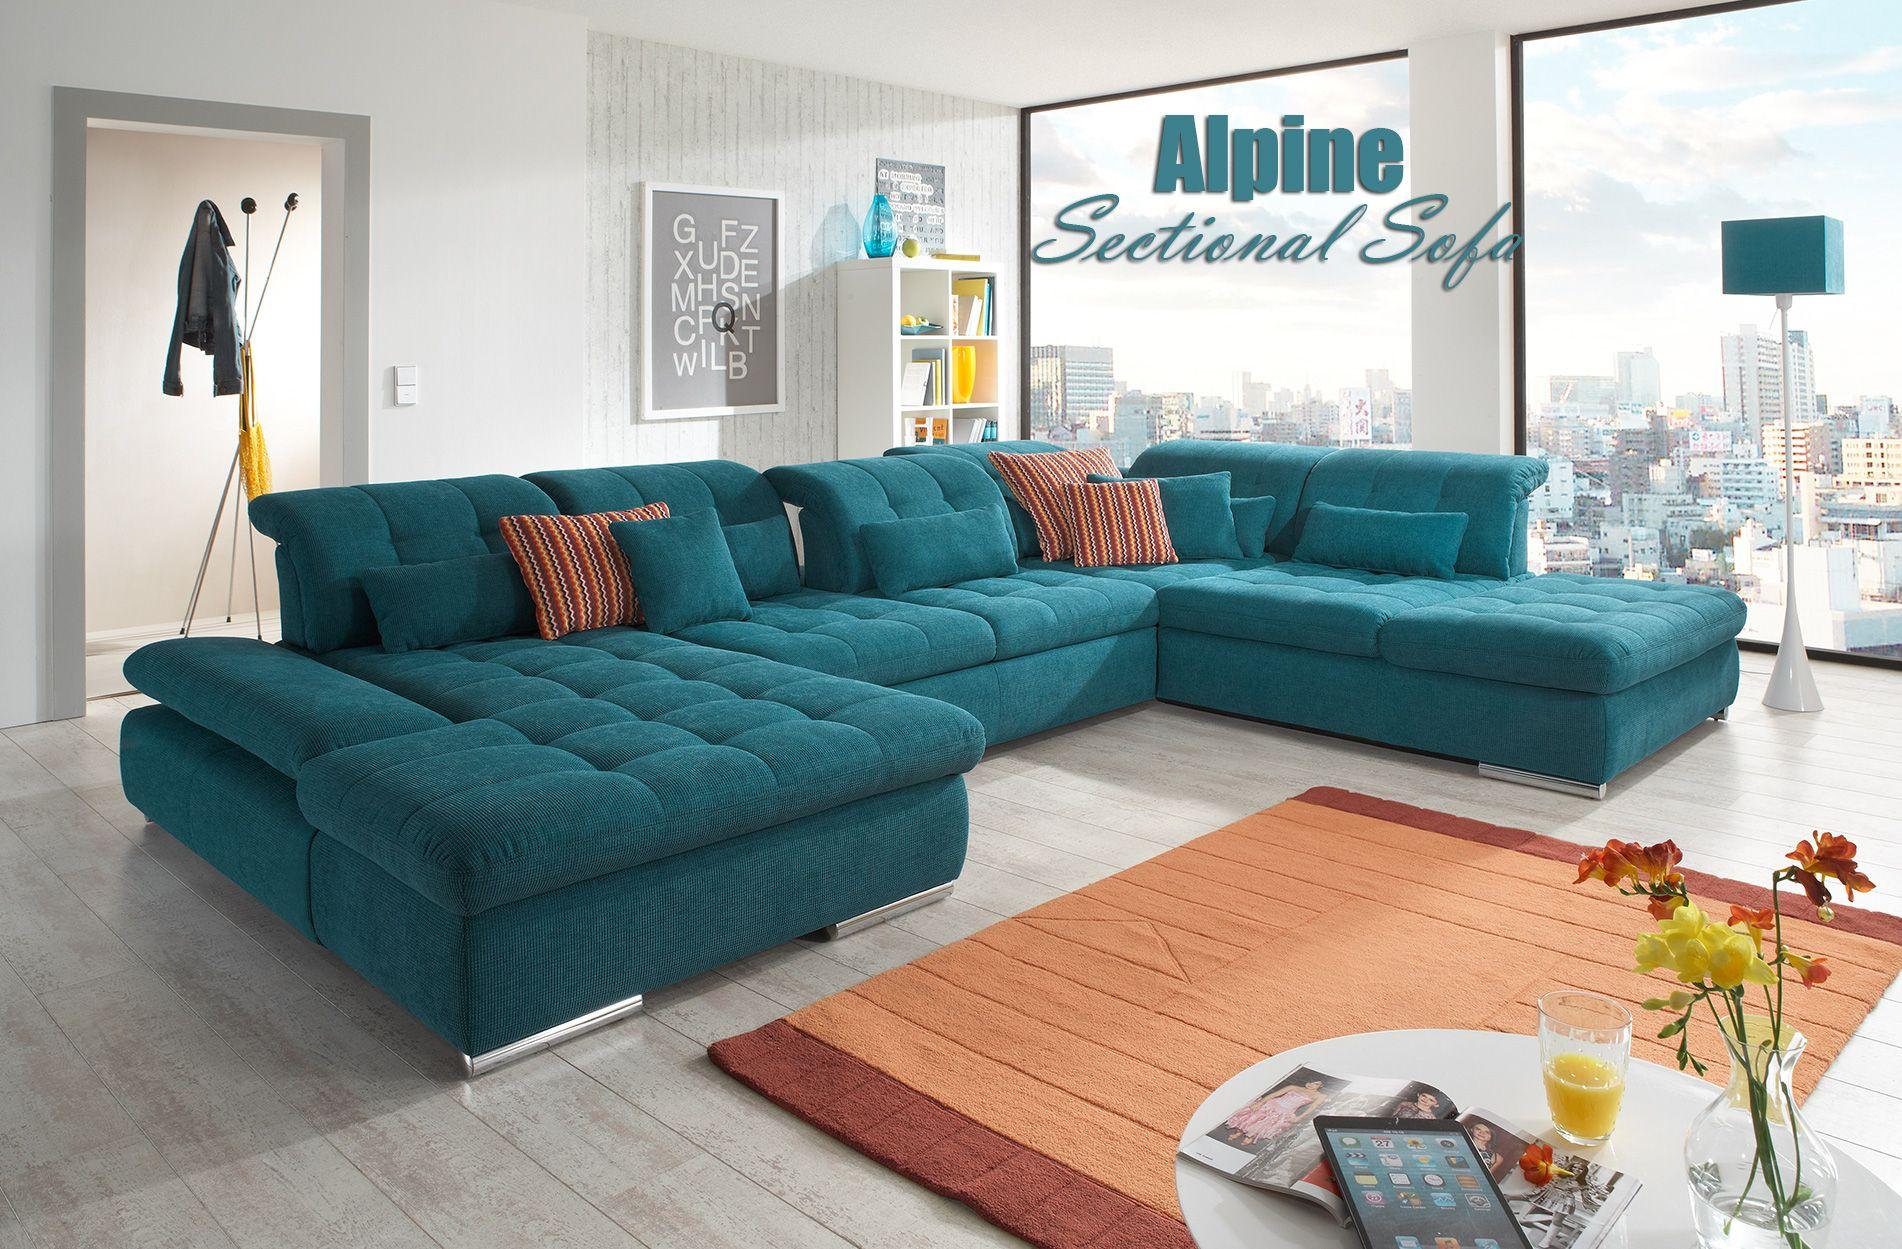 Alpine Sectional Sofa Sleeper With Storage Modern Sofa Sectional